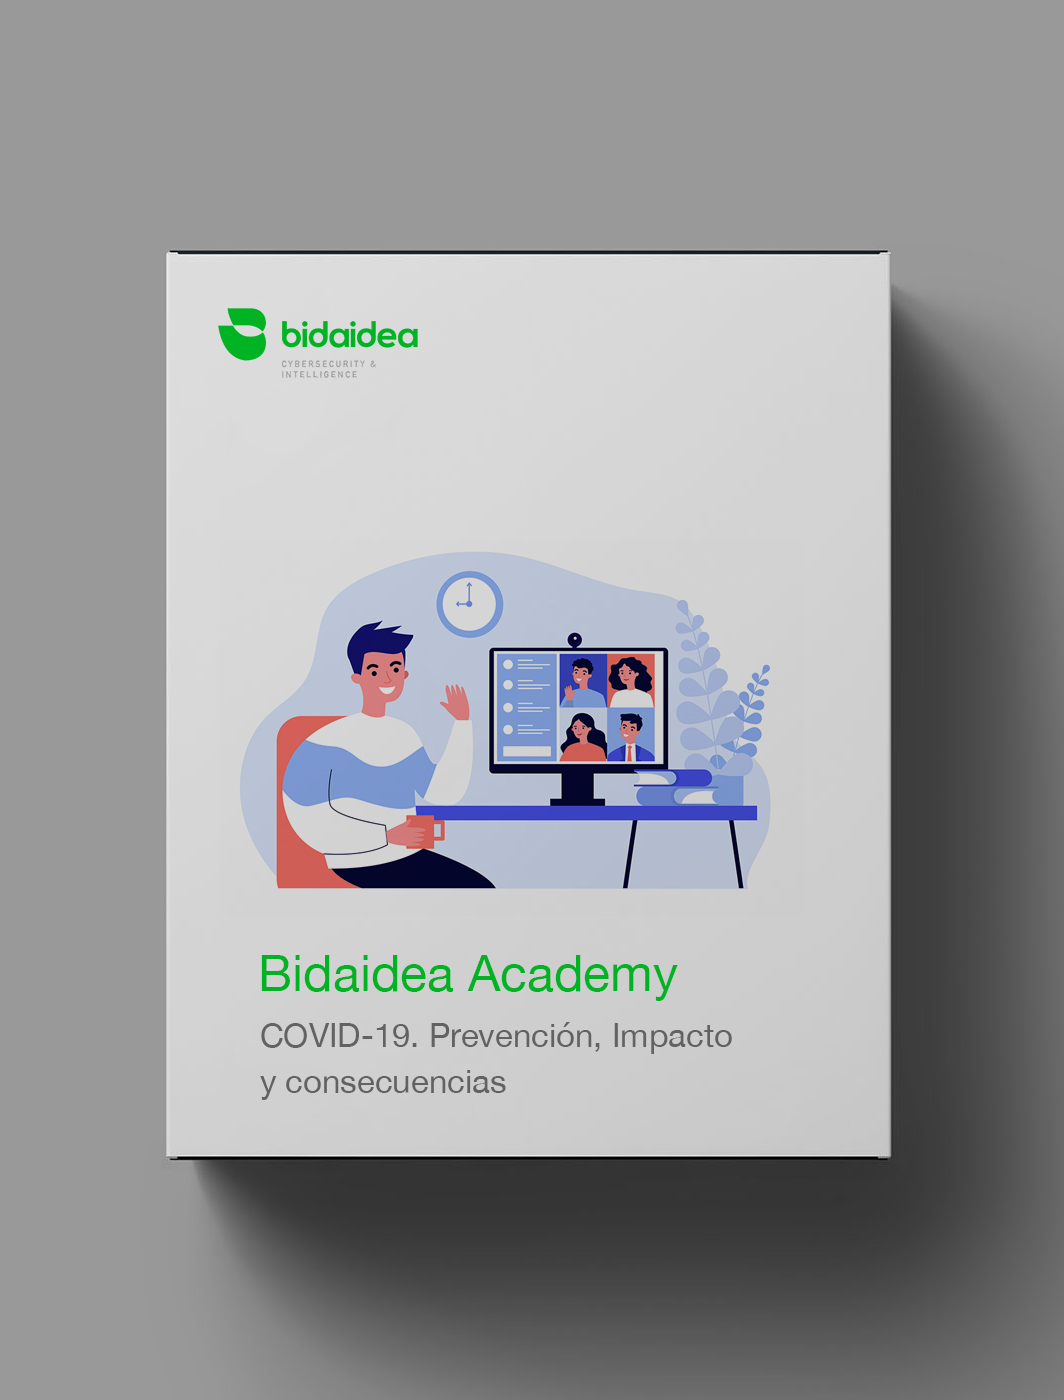 cyberpacks bidaidea academy 07 - Empresa de Ciberseguridad